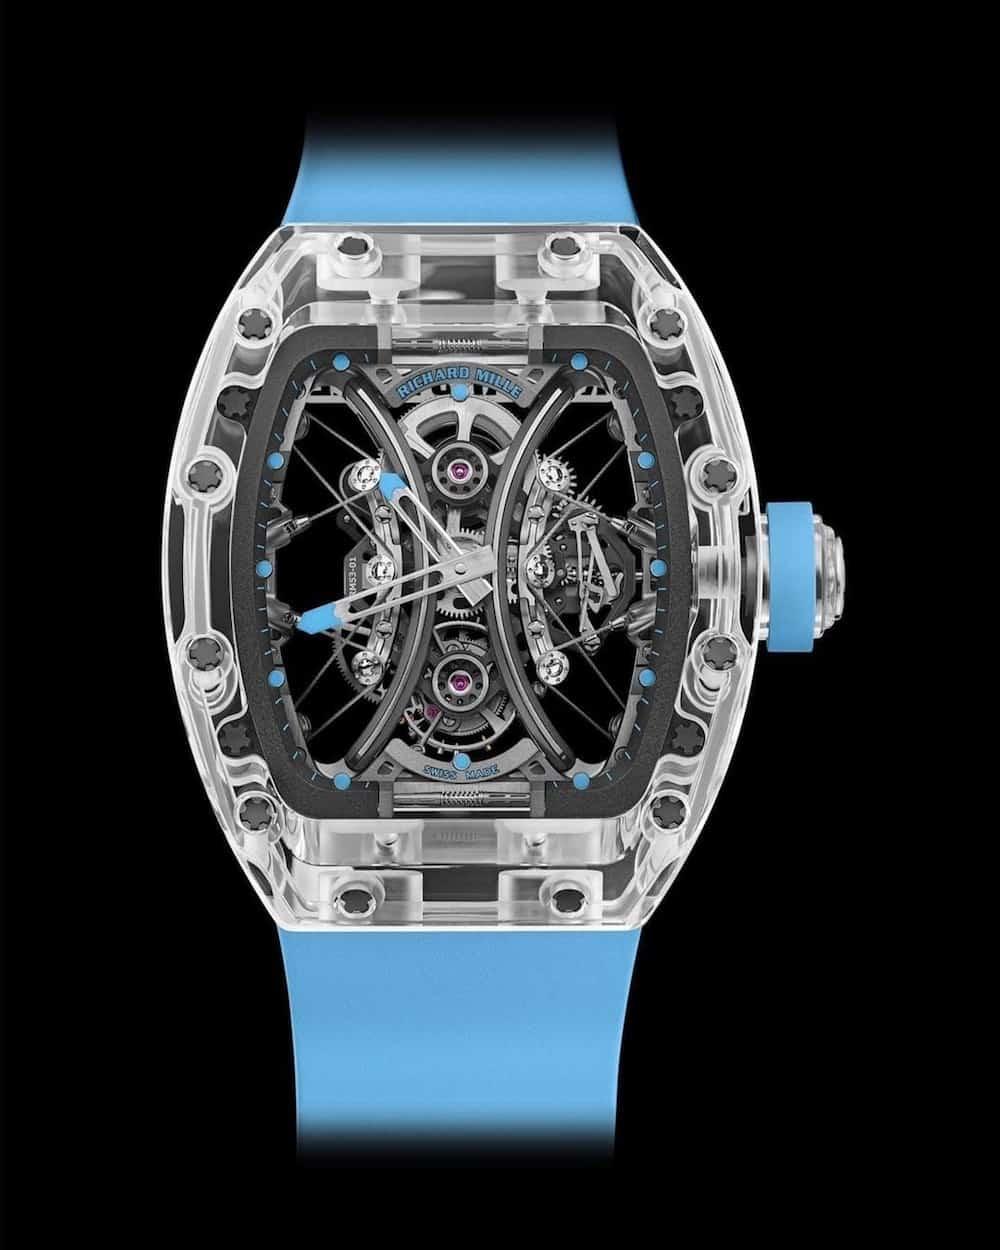 Richard Mille RM 53-02 Tourbillon Sapphire 3